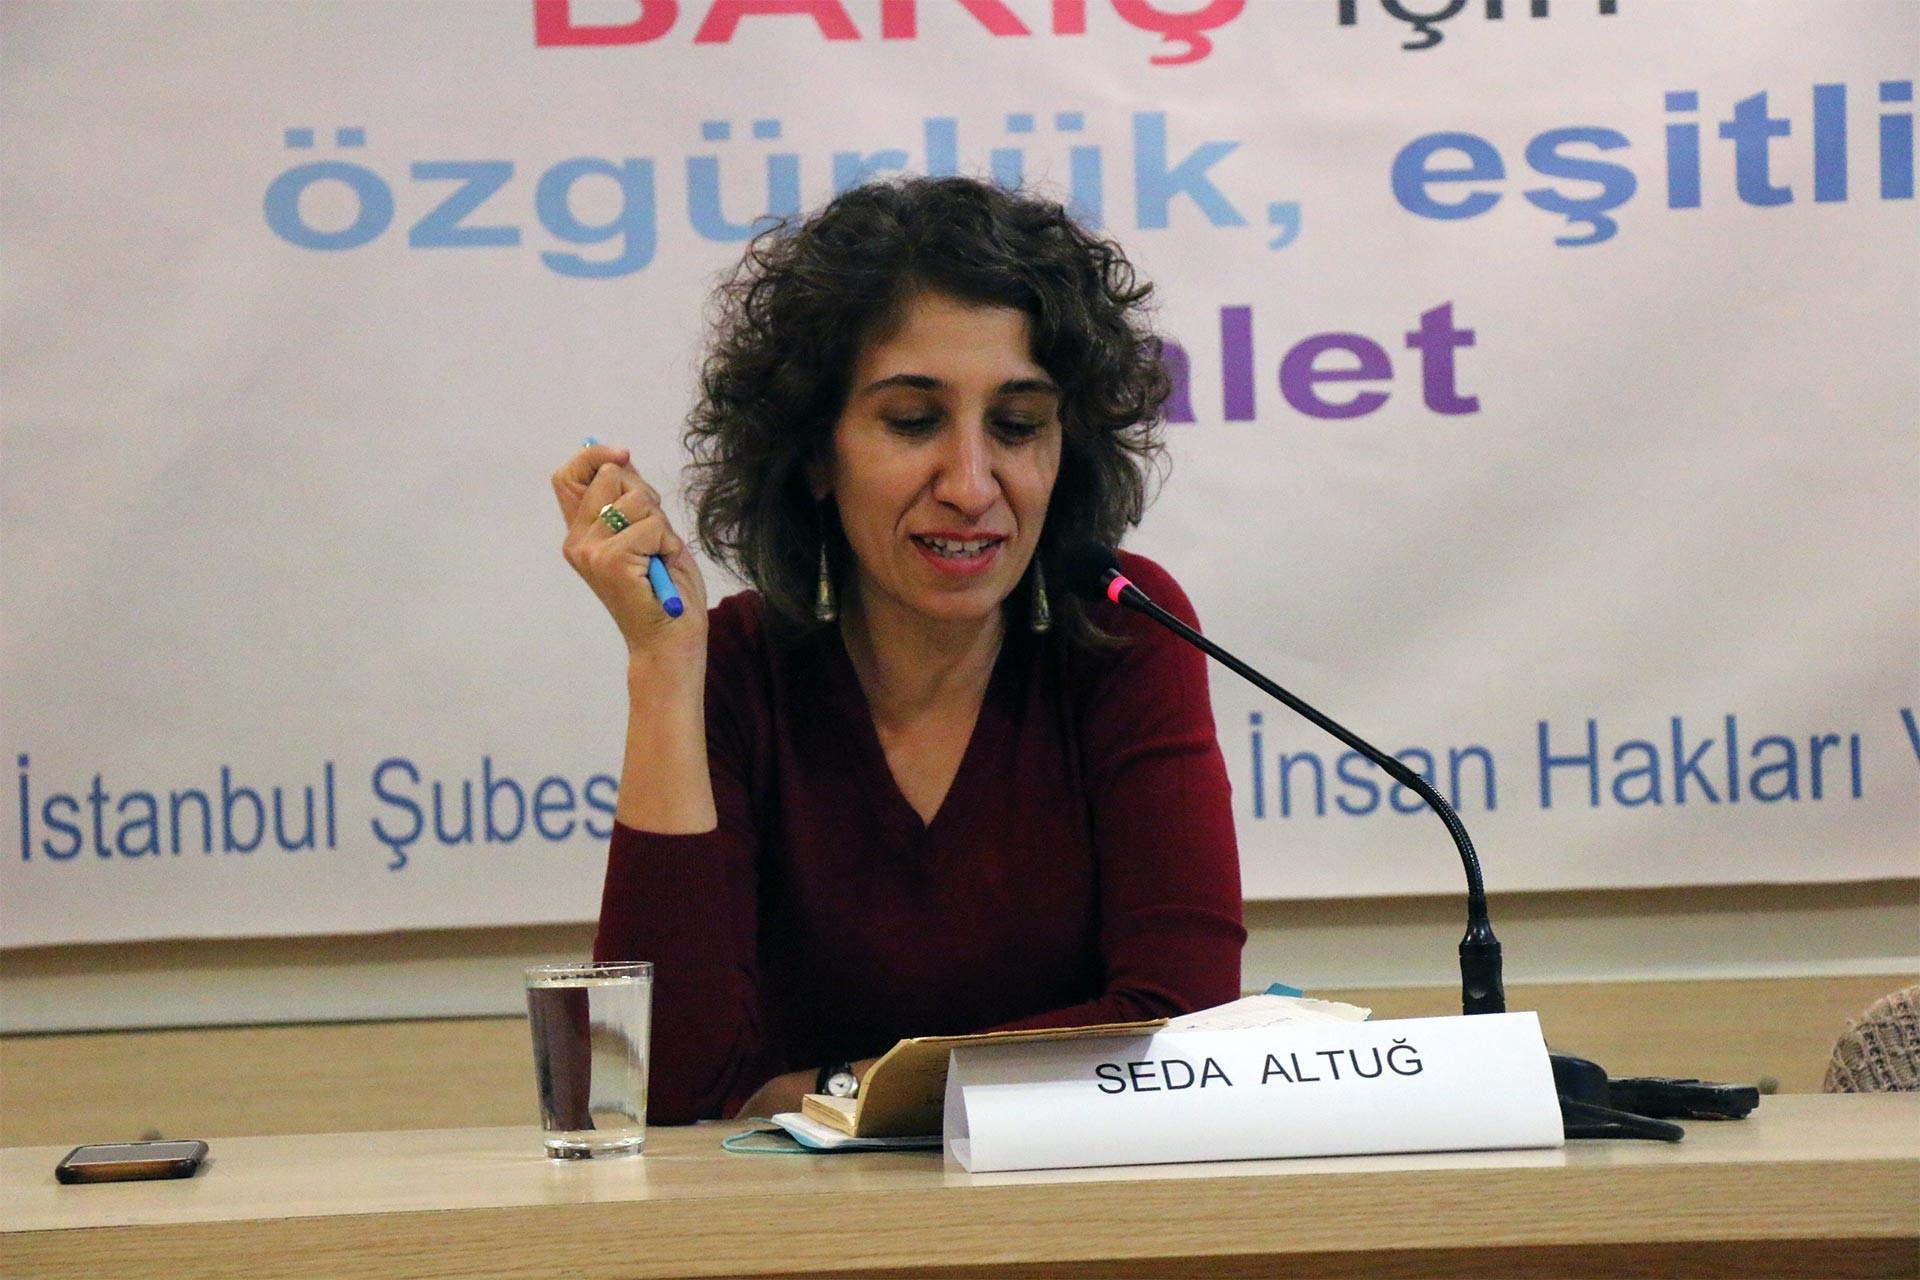 Seda Altuğ